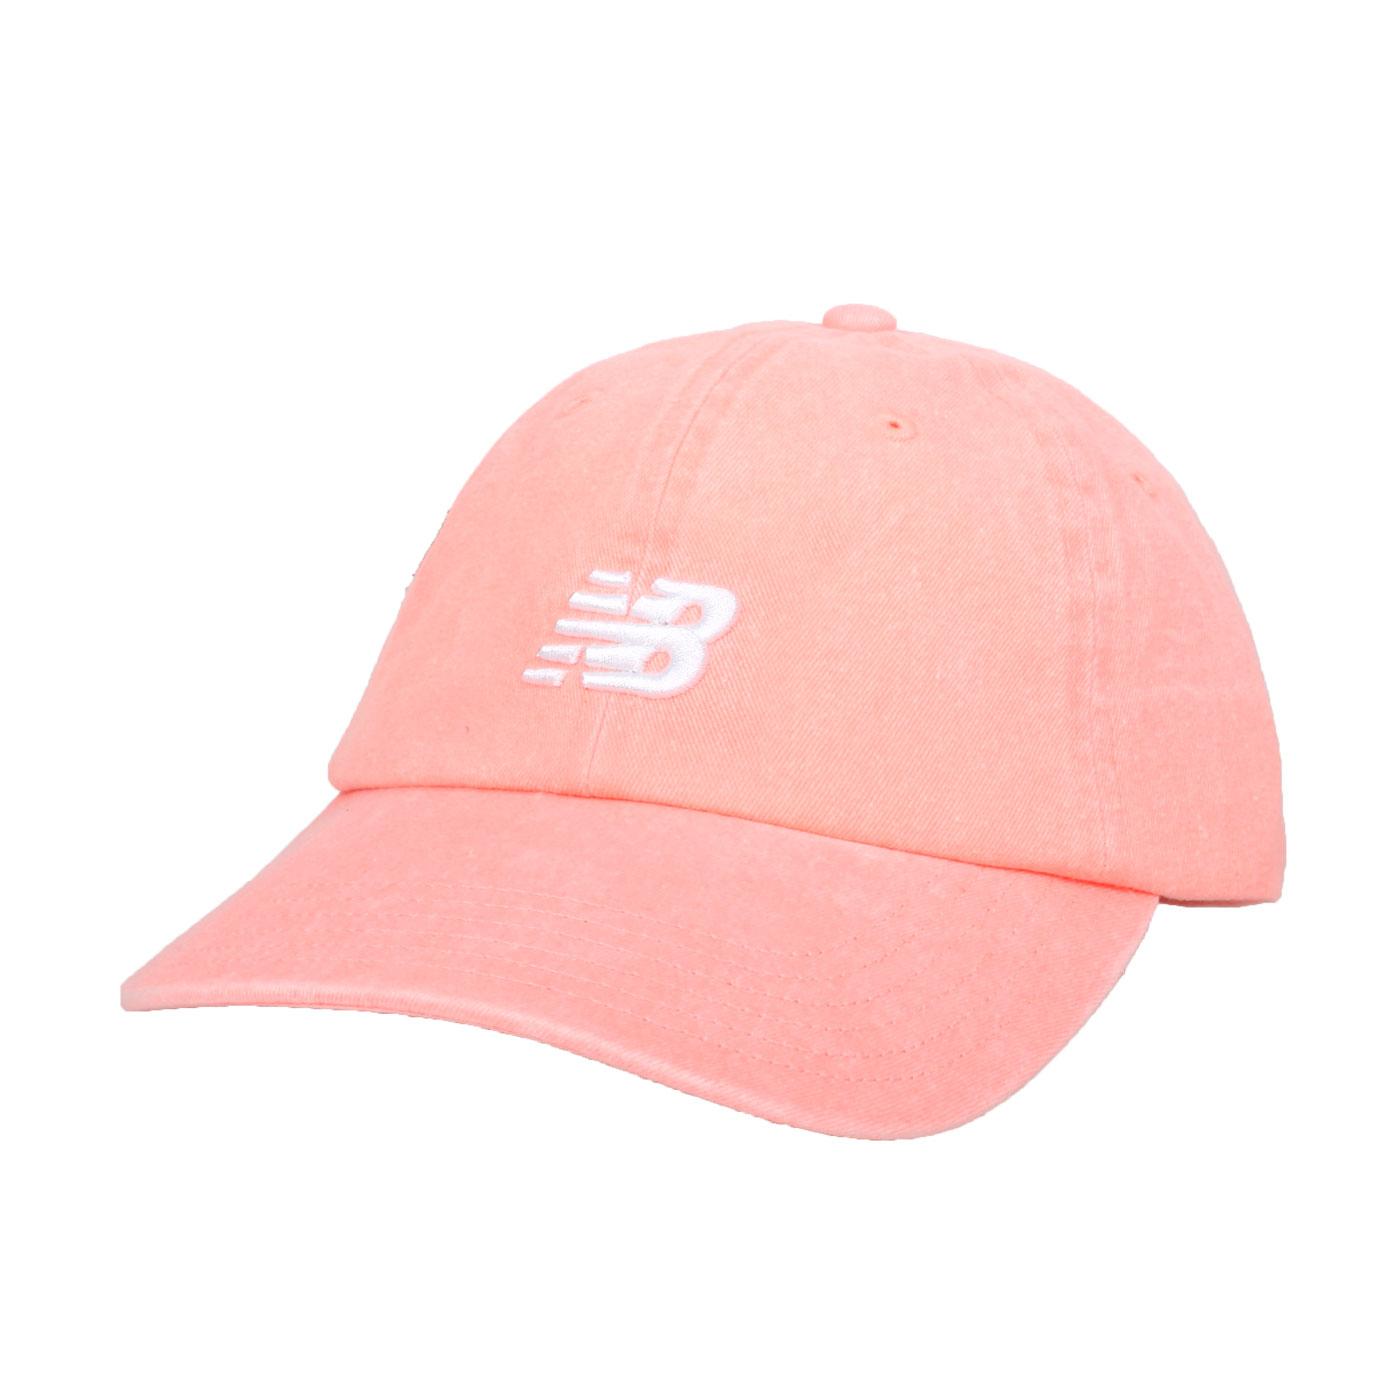 NEW BALANCE 帽子 LAH91014PPI - 螢光粉白